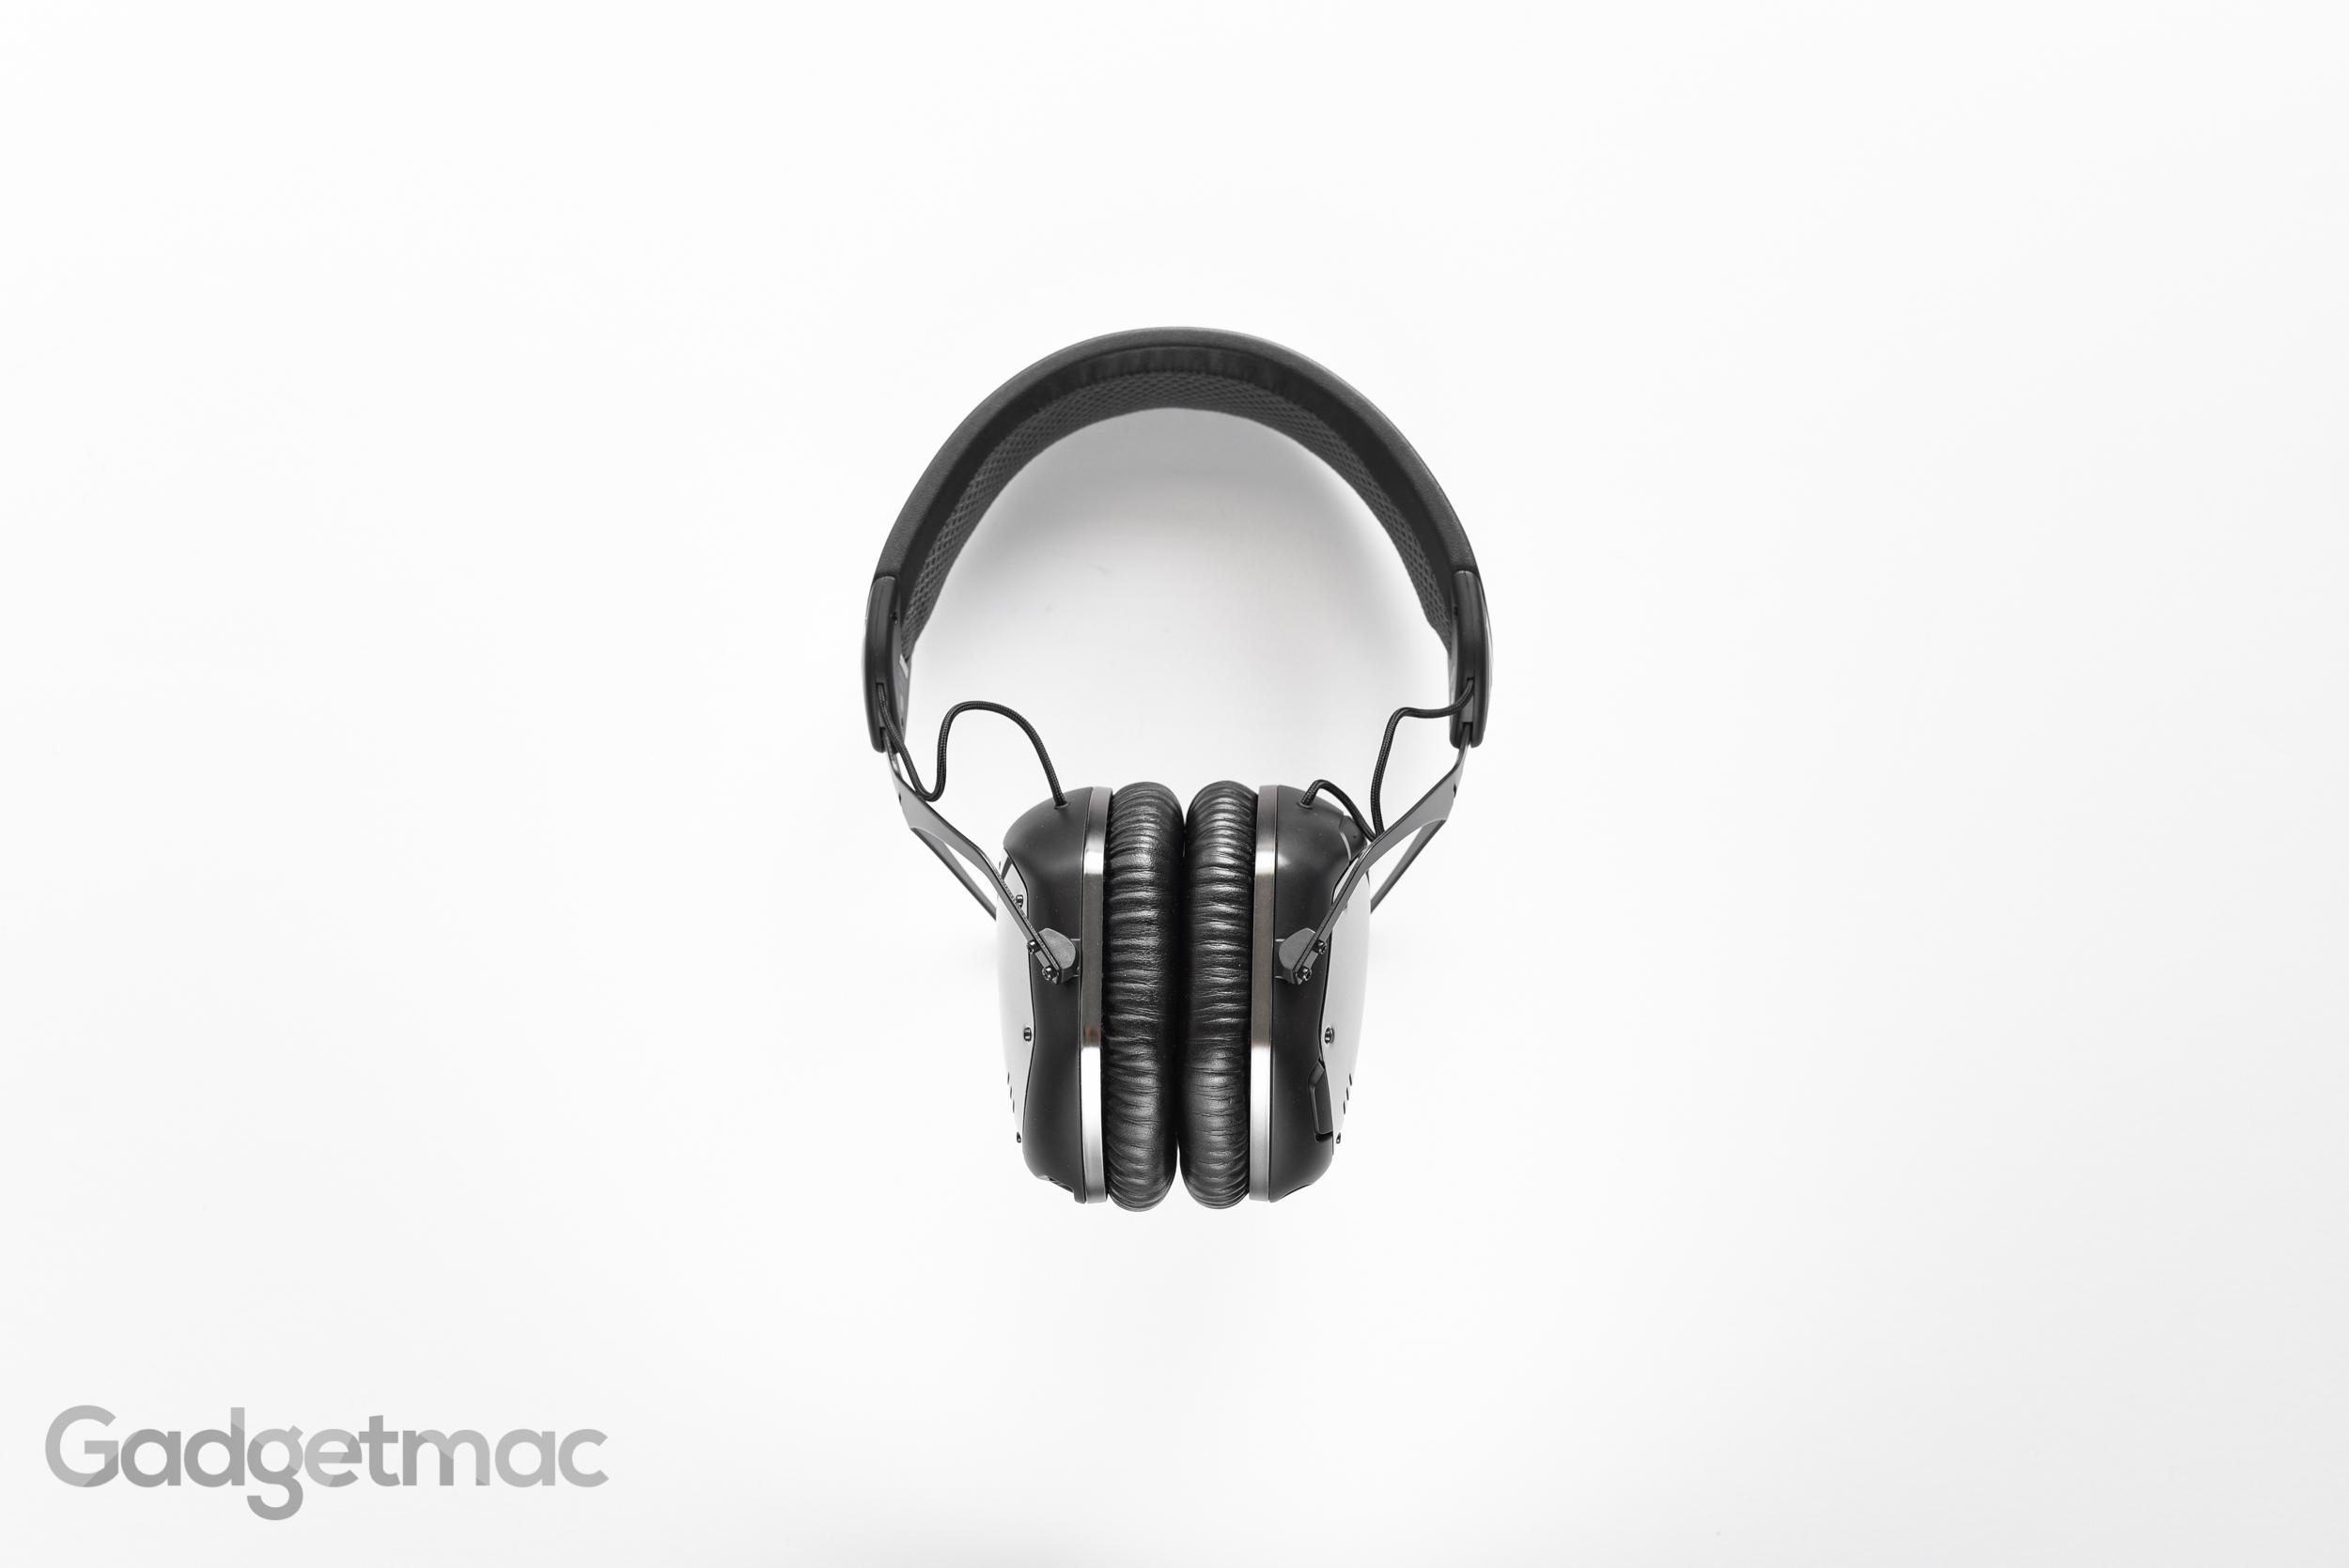 v-moda-crossfade-wireless-headphones-ear-pads.jpg